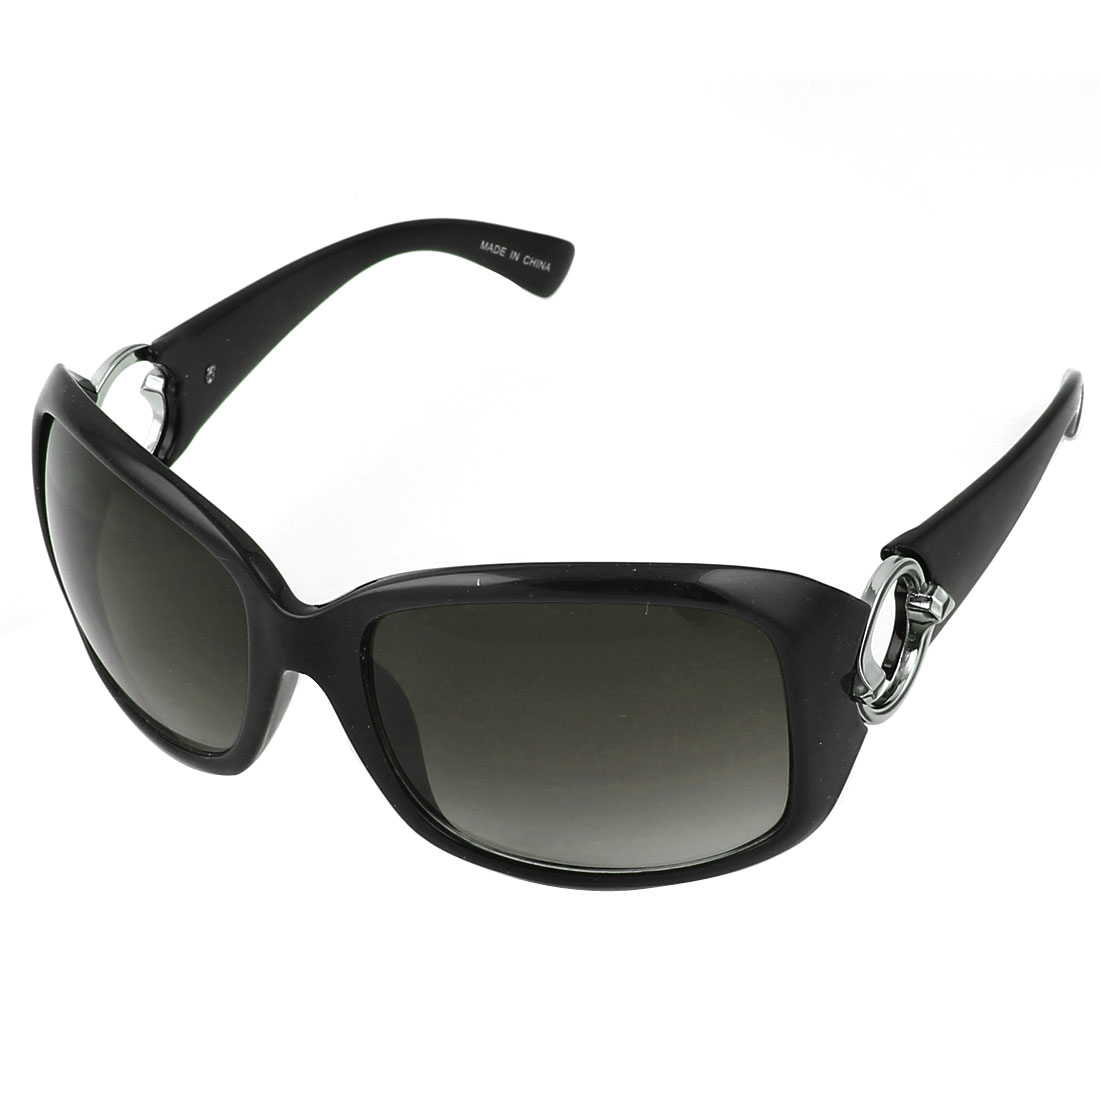 Lady Plastic Black Full Frame Round Detail Arm Square Lens Sunglasses